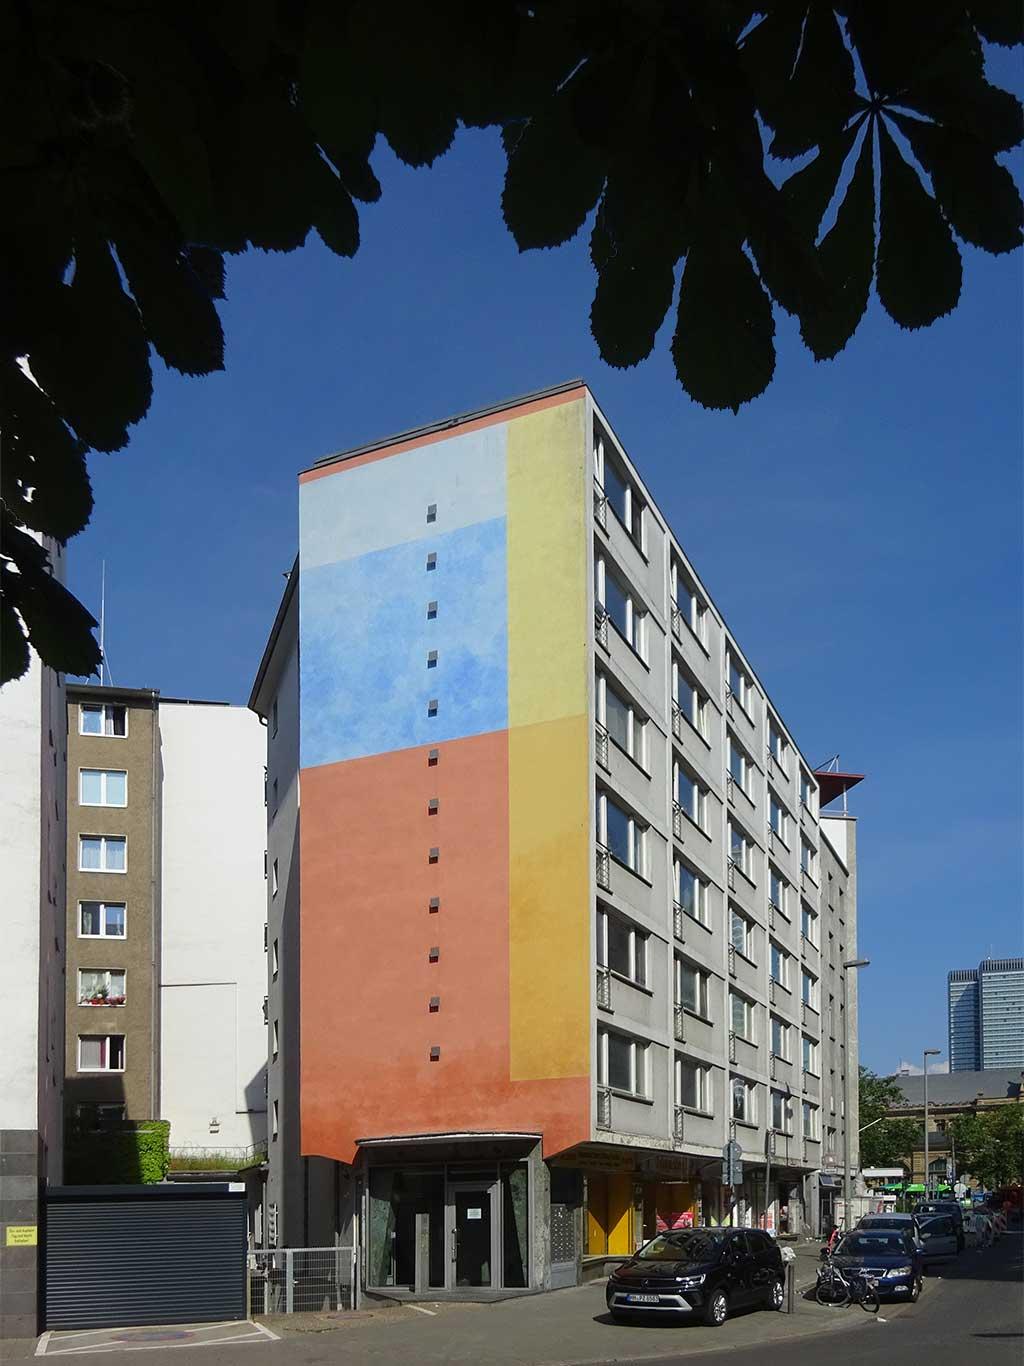 Stadtbilder Frankfurt - Bunte Hausfassade am Wieshüttenplatz in Frankfurt